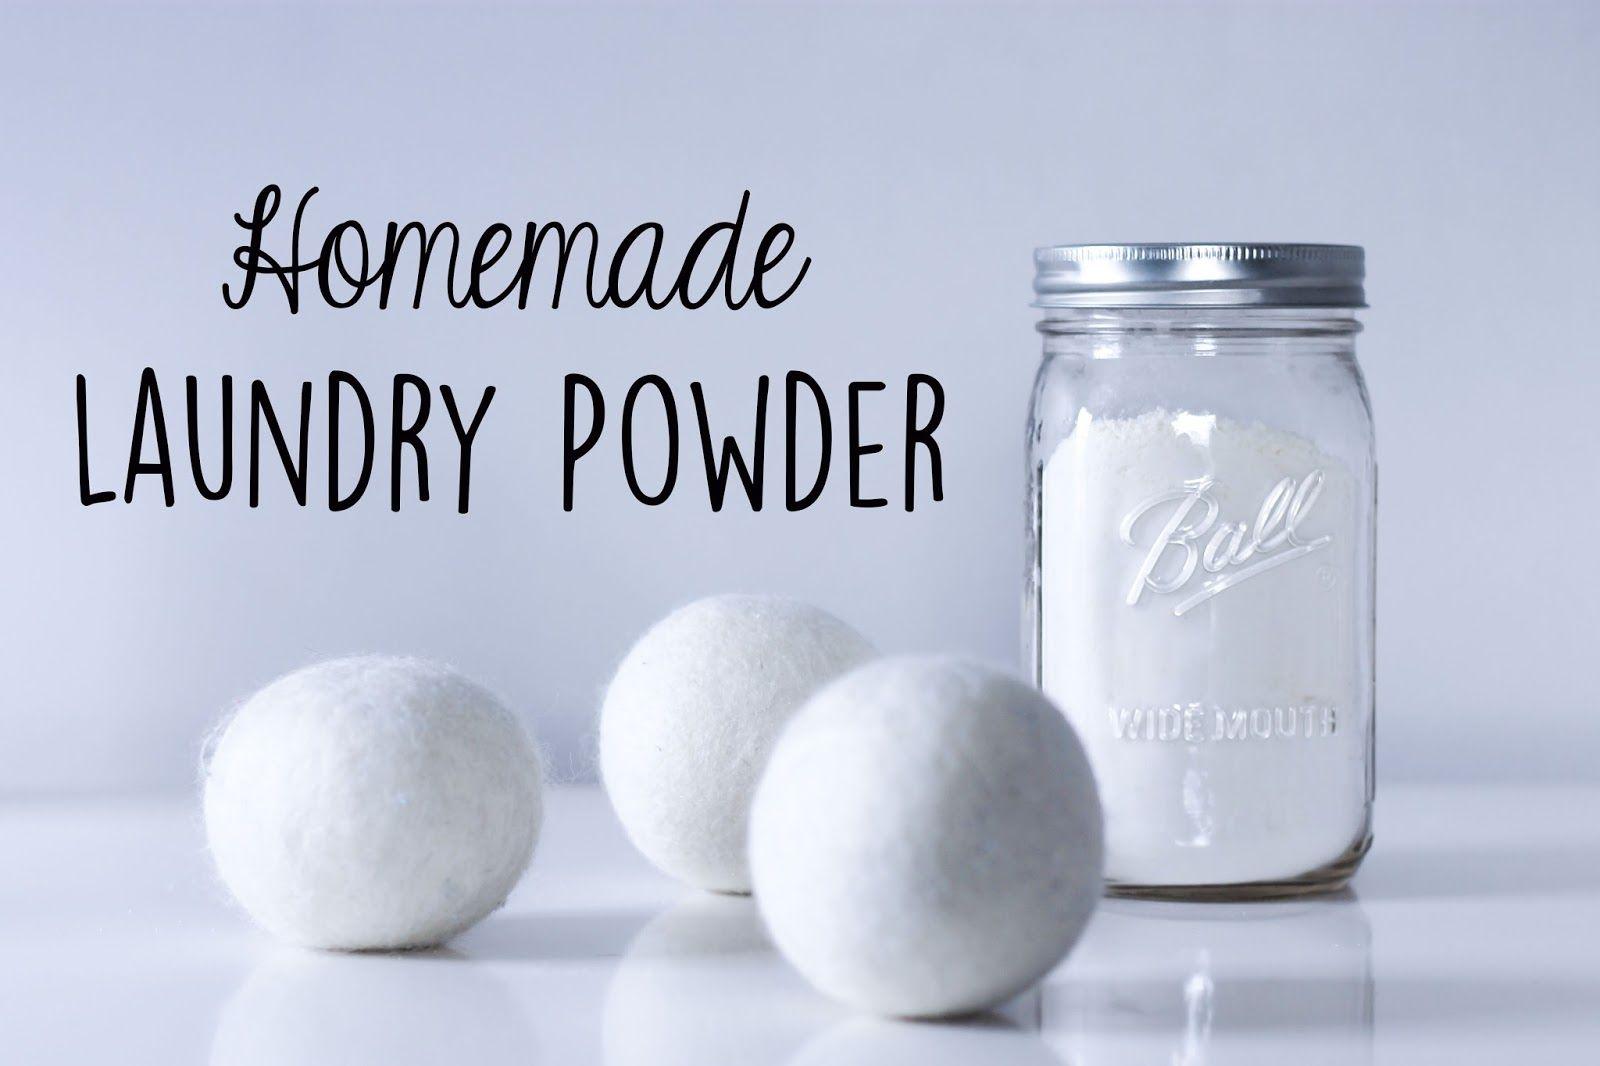 Homemade Laundry Powder Laundry Powder Diy Laundry Detergent